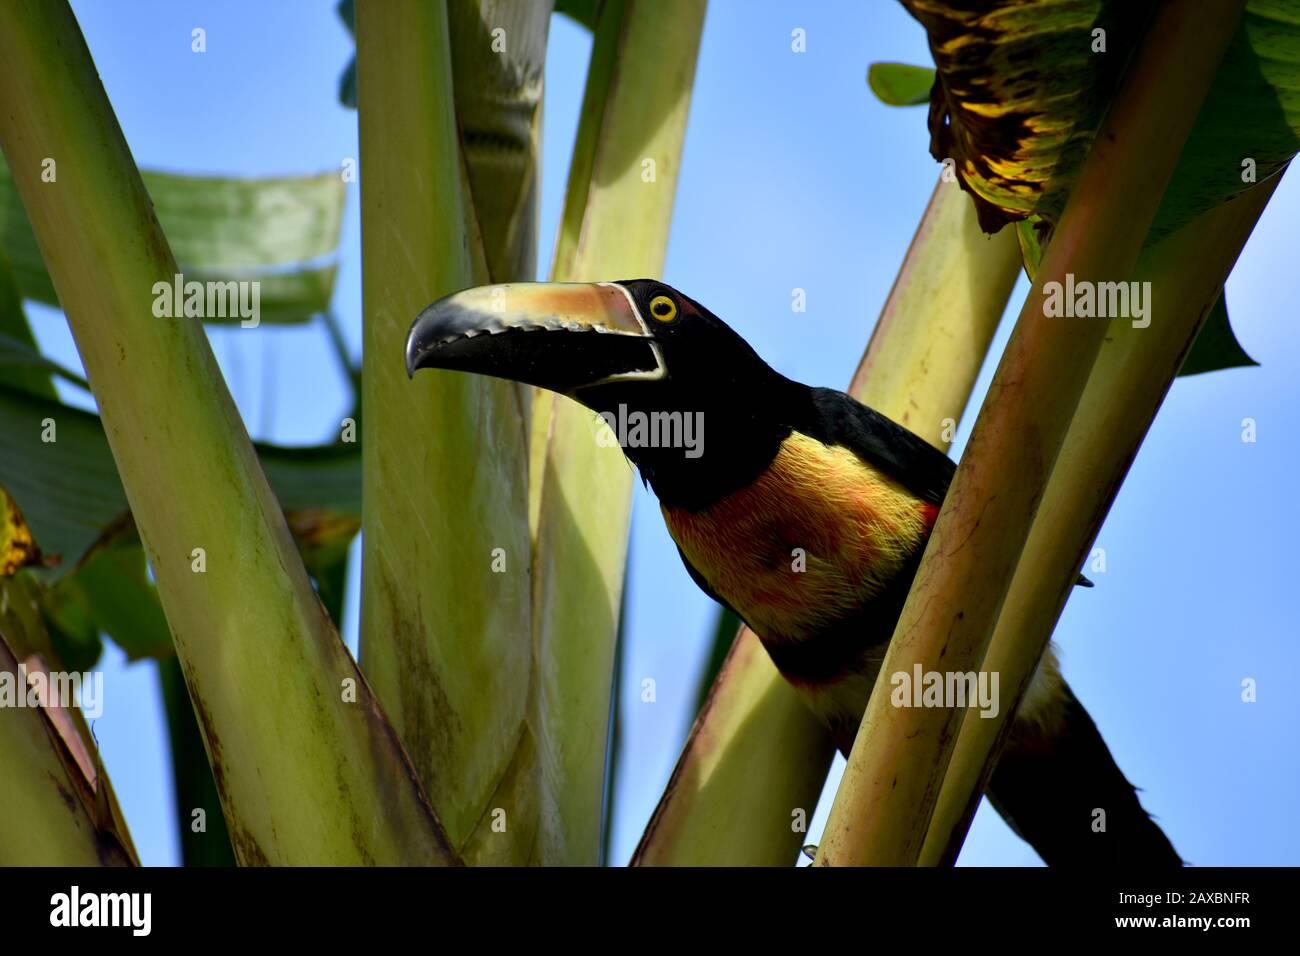 A collared aracari seen in Tenorio Volcano National Park, Costa Rica Stock Photo